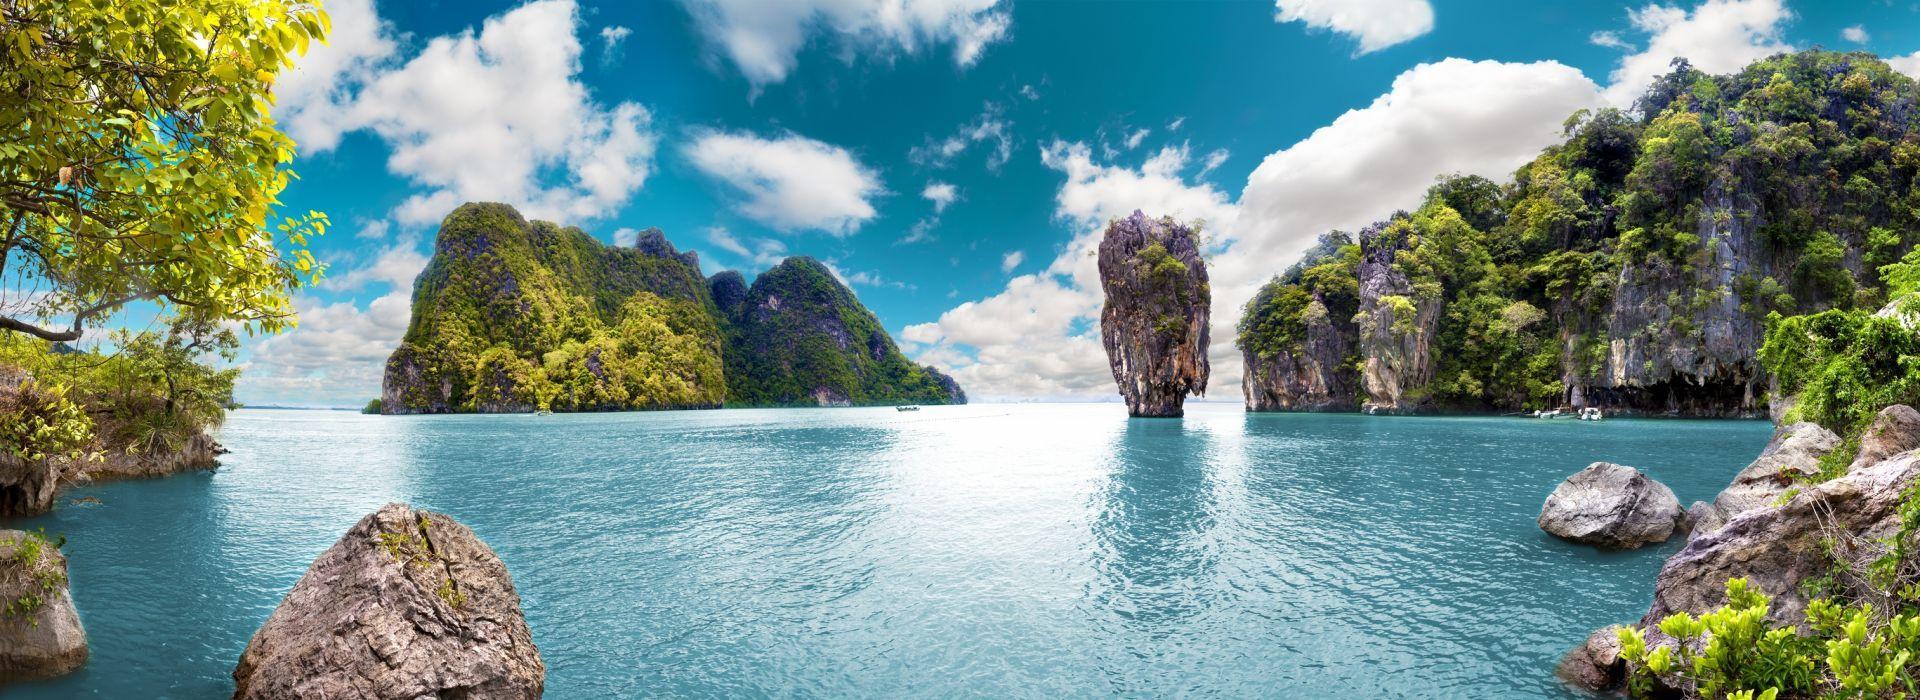 Walking tours in Thailand